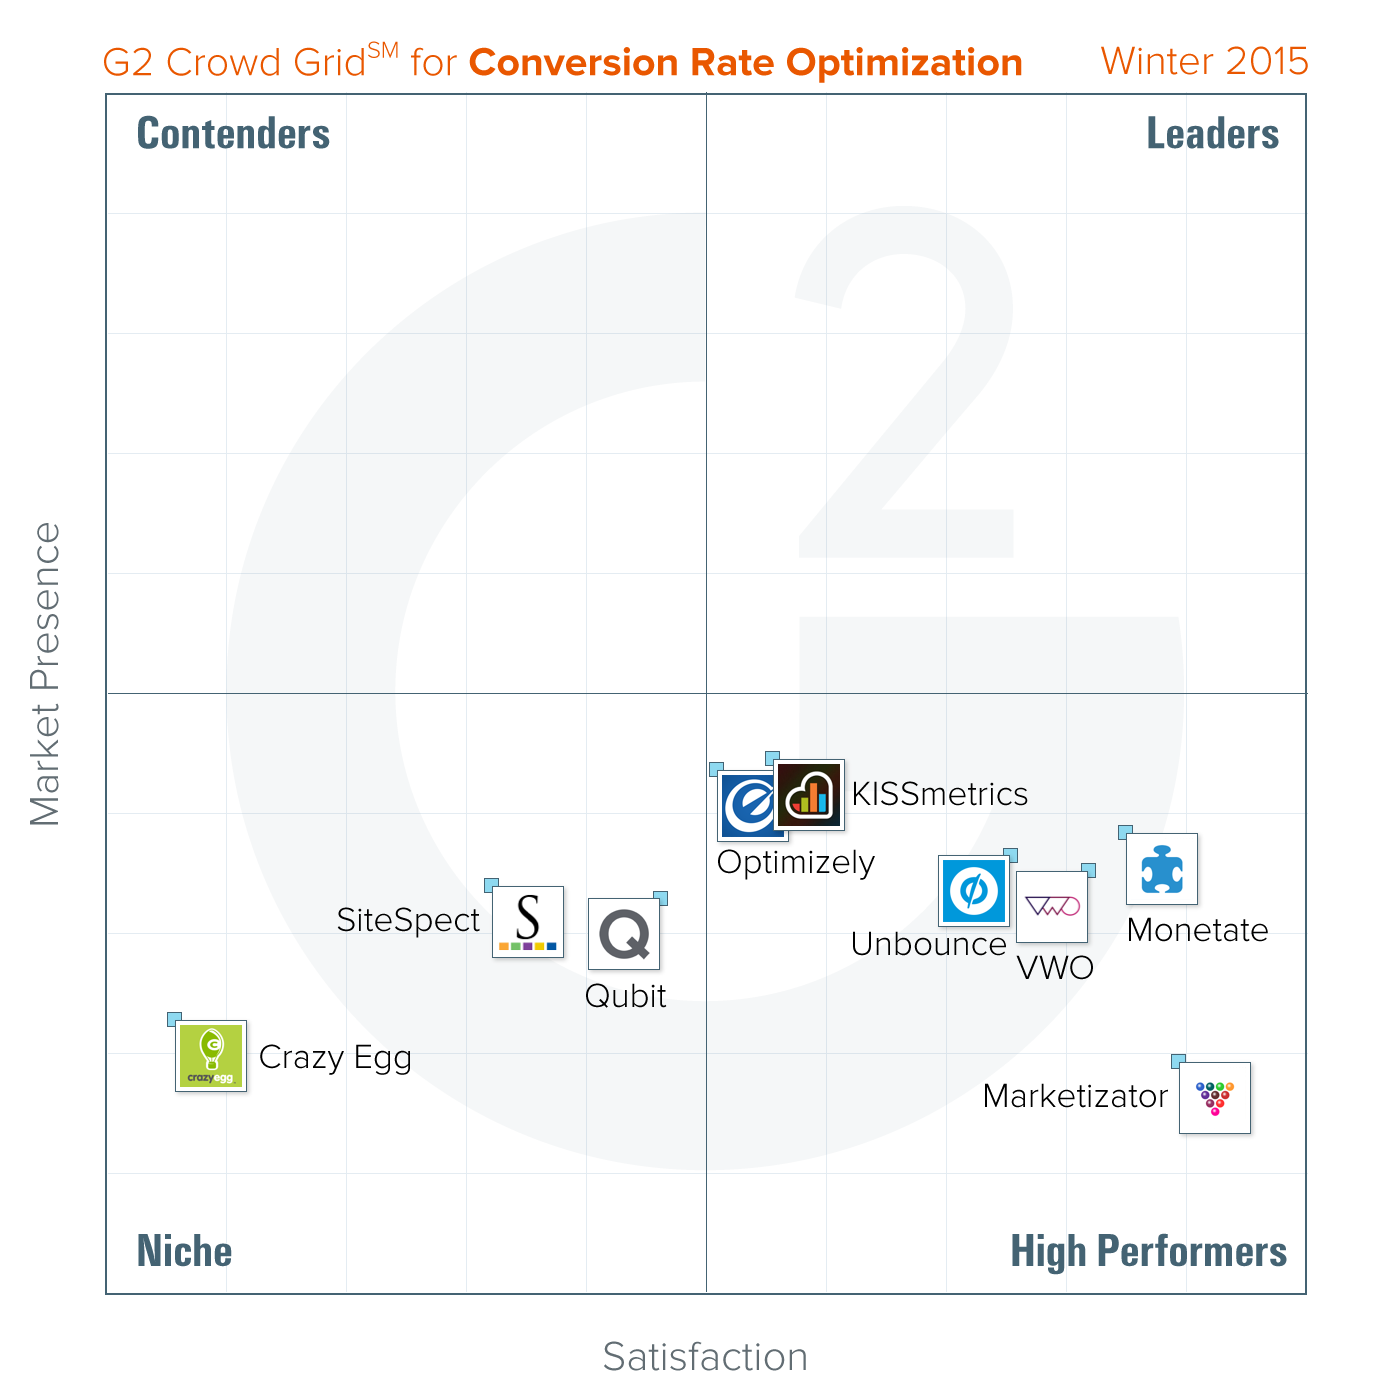 best-optimization-cro-tools-winter-2015-g2-crowd[5]